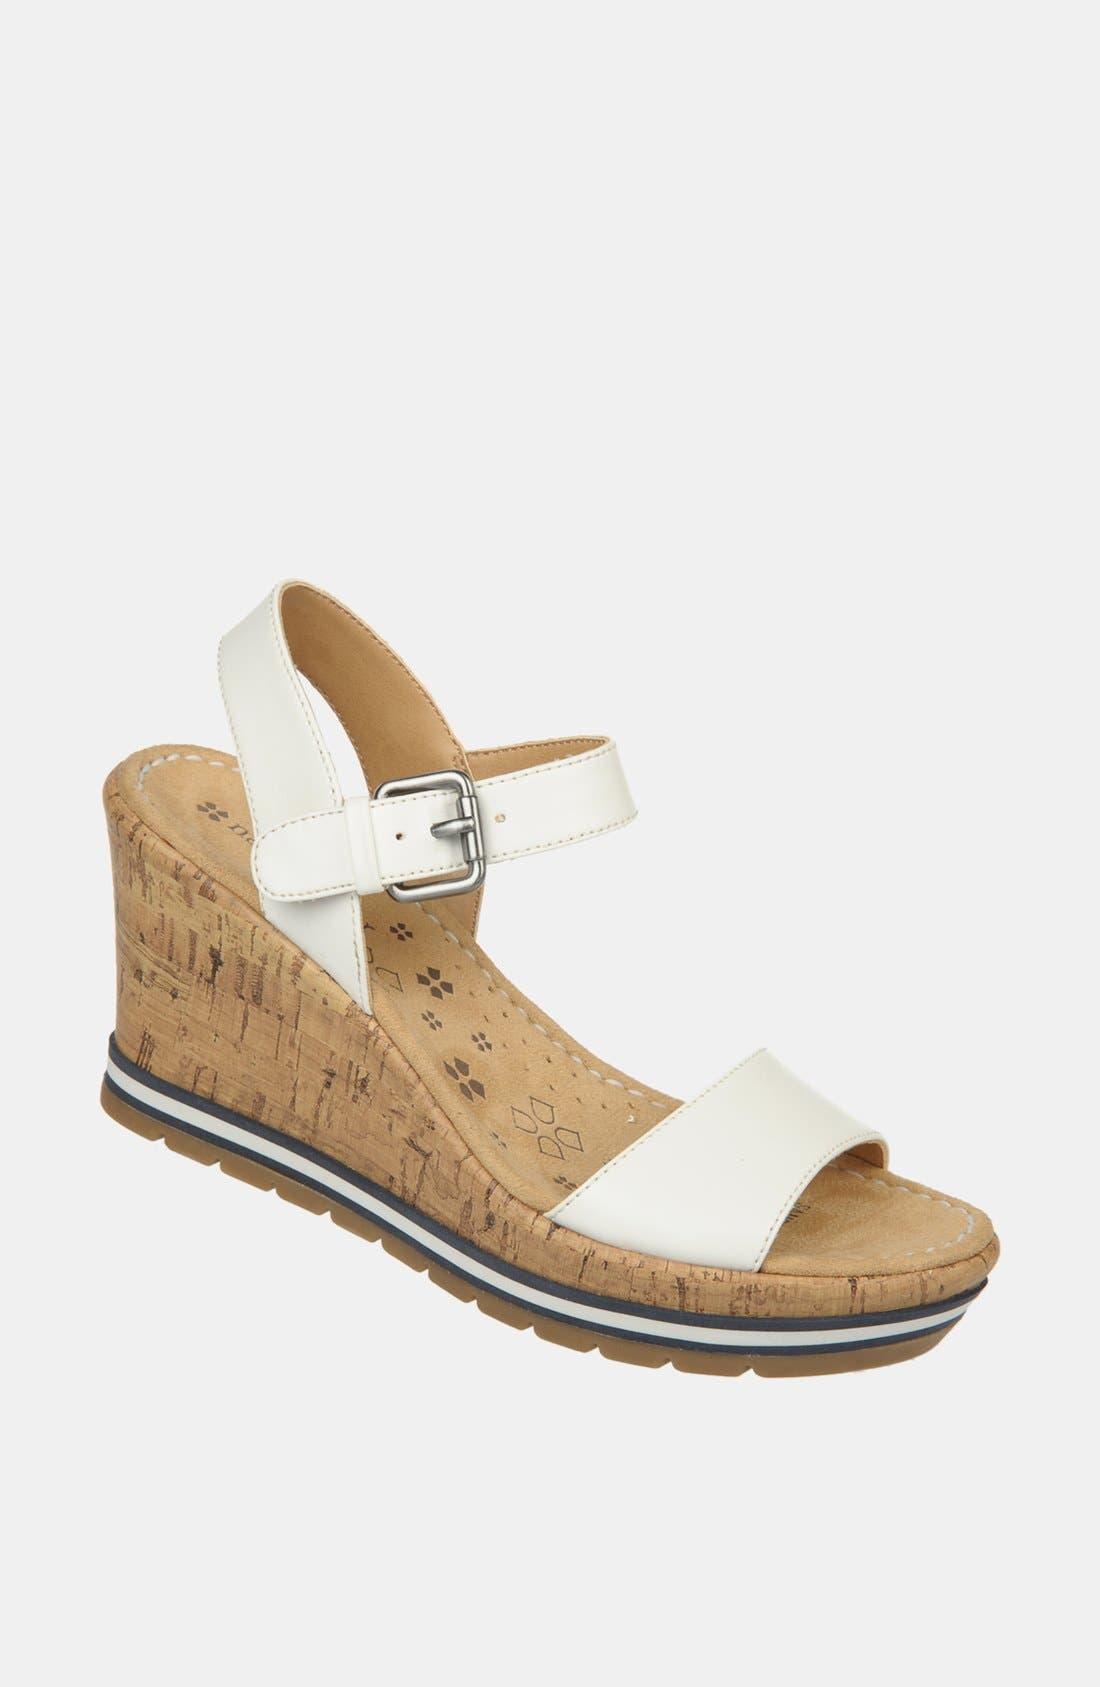 Alternate Image 1 Selected - Naturalizer 'Norton' Sandal